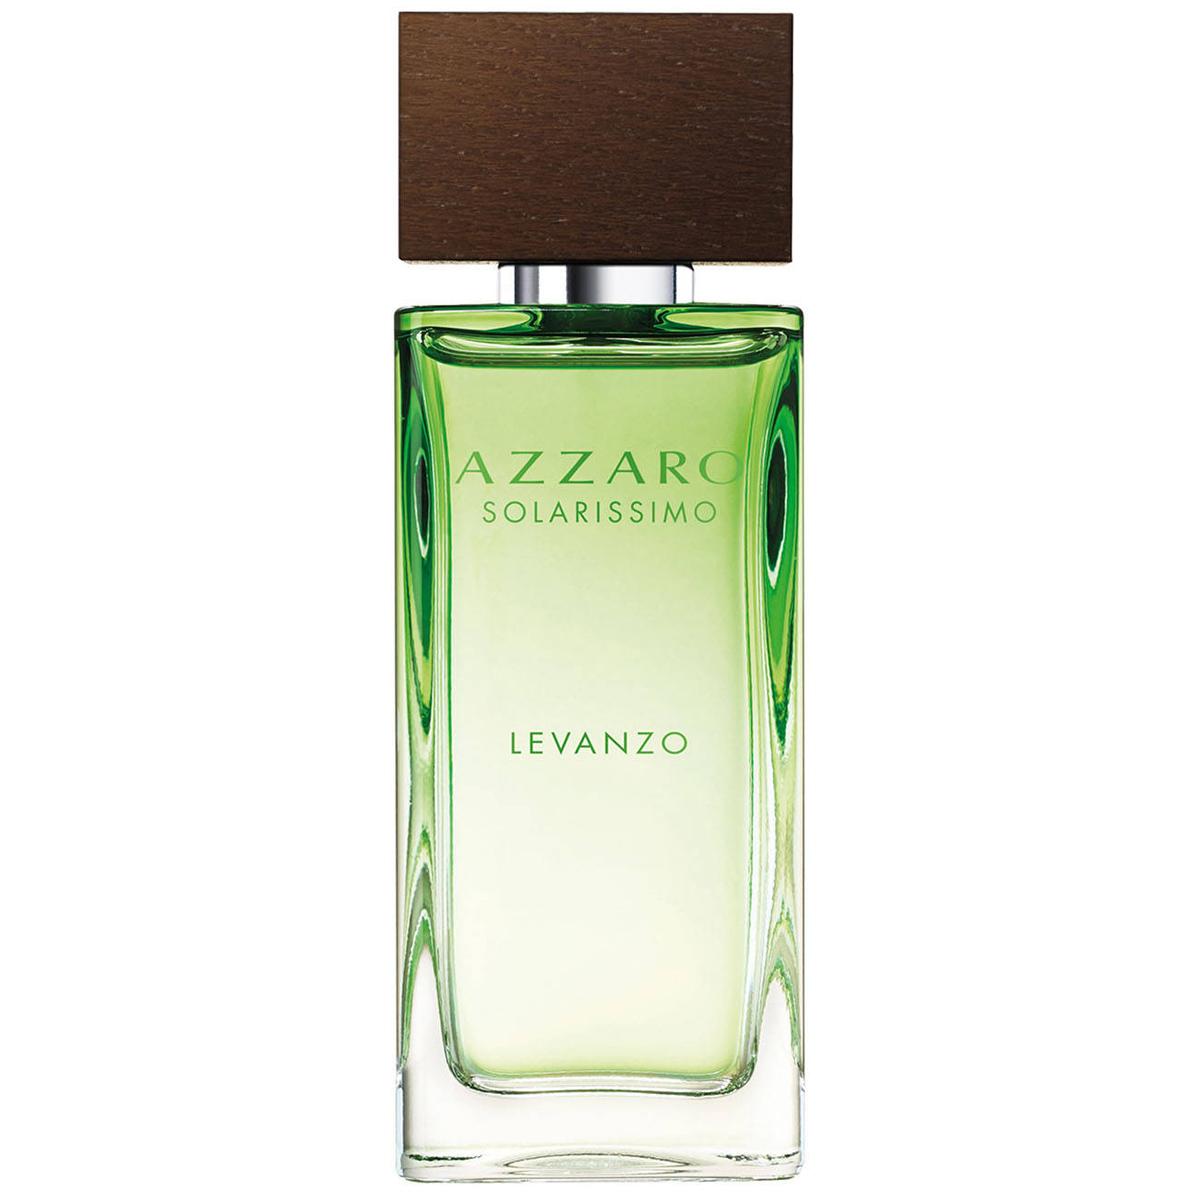 Azzaro - Solarissimo Levanzo - Eau de Toilette